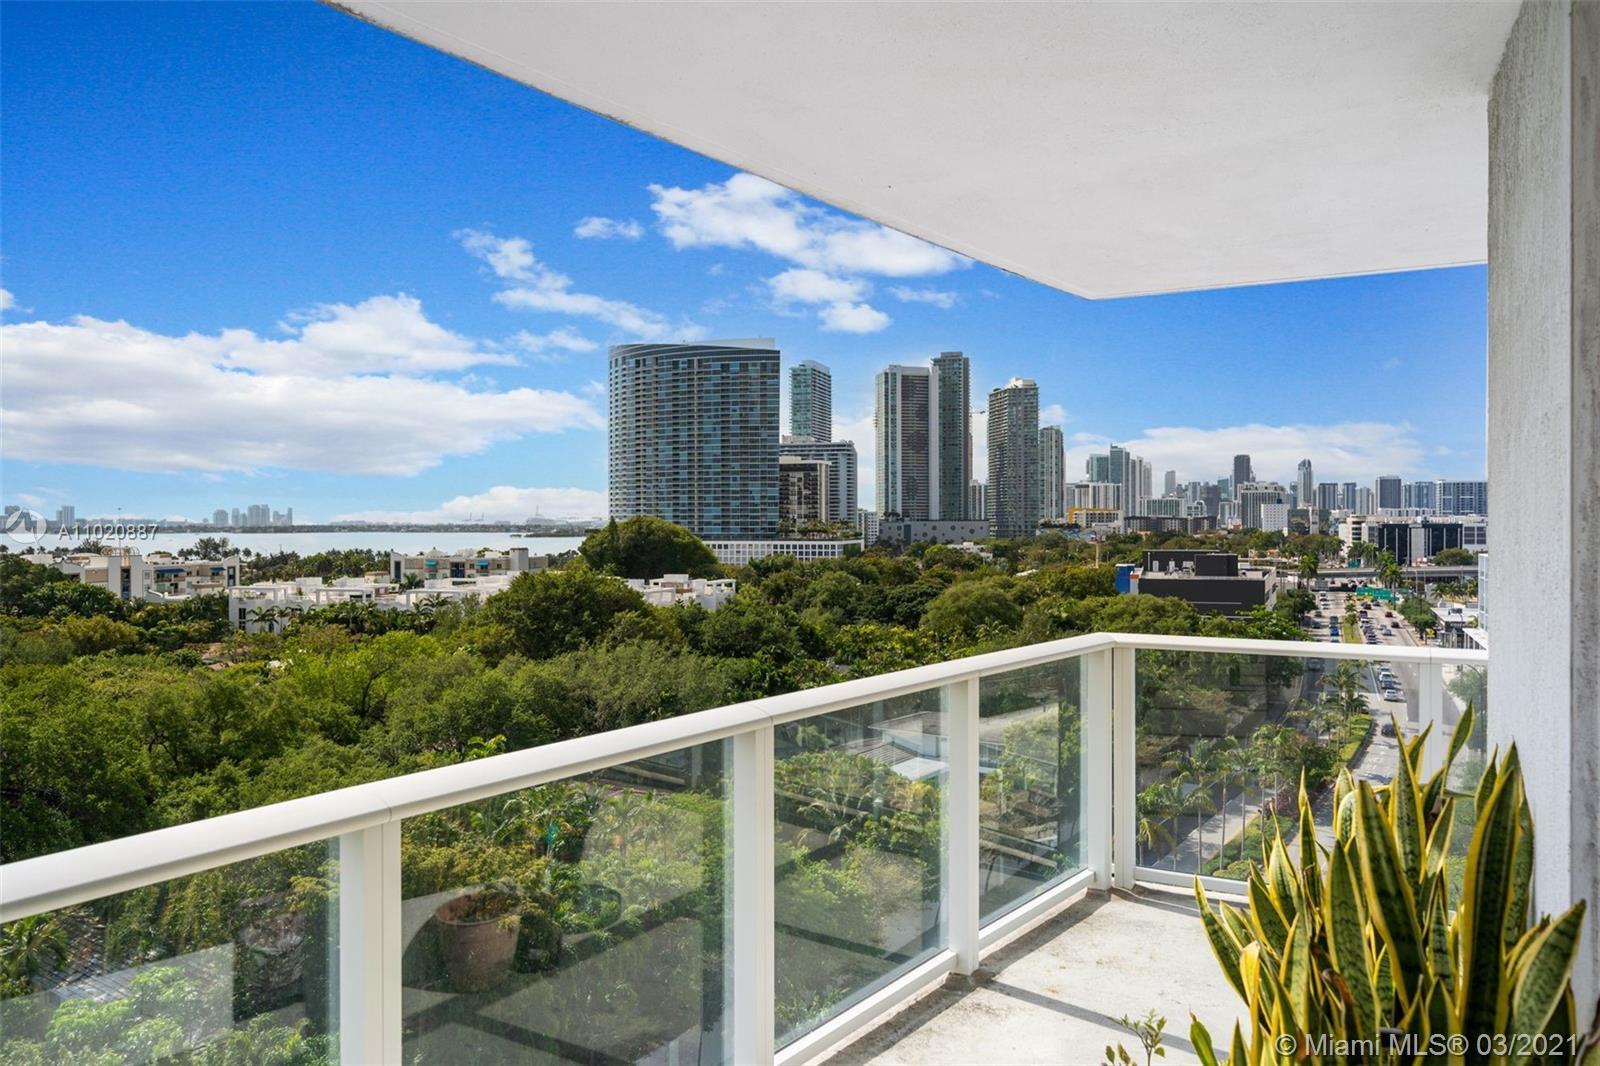 Stunning Corner Unit w Bay Views at Baltus House. 2015 Construction, Brand New, Iconic Miami Luxury.